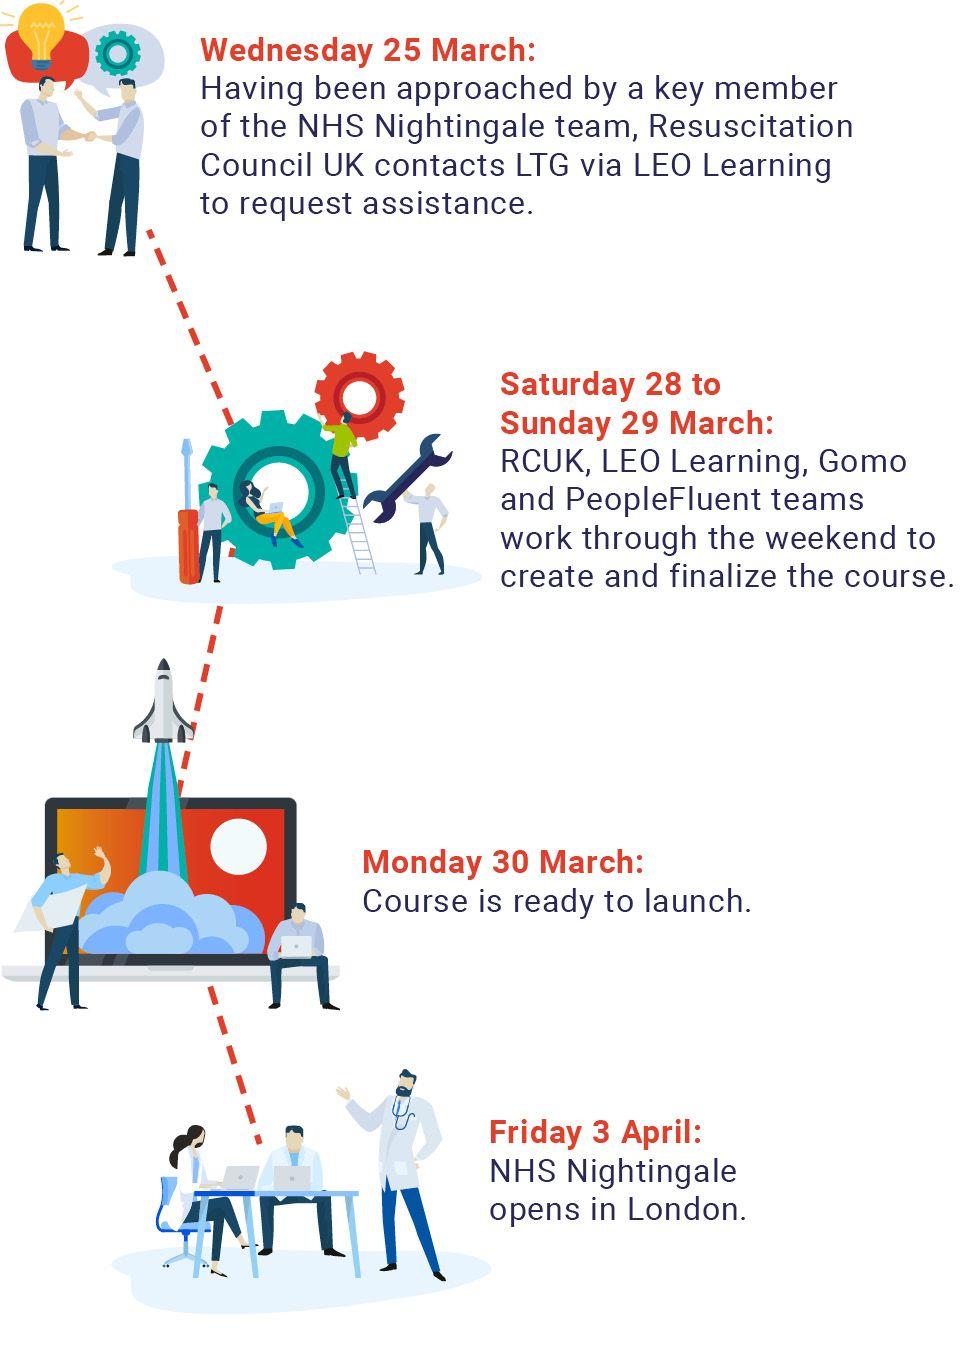 Timeline showing development of Resuscitation Council UK content